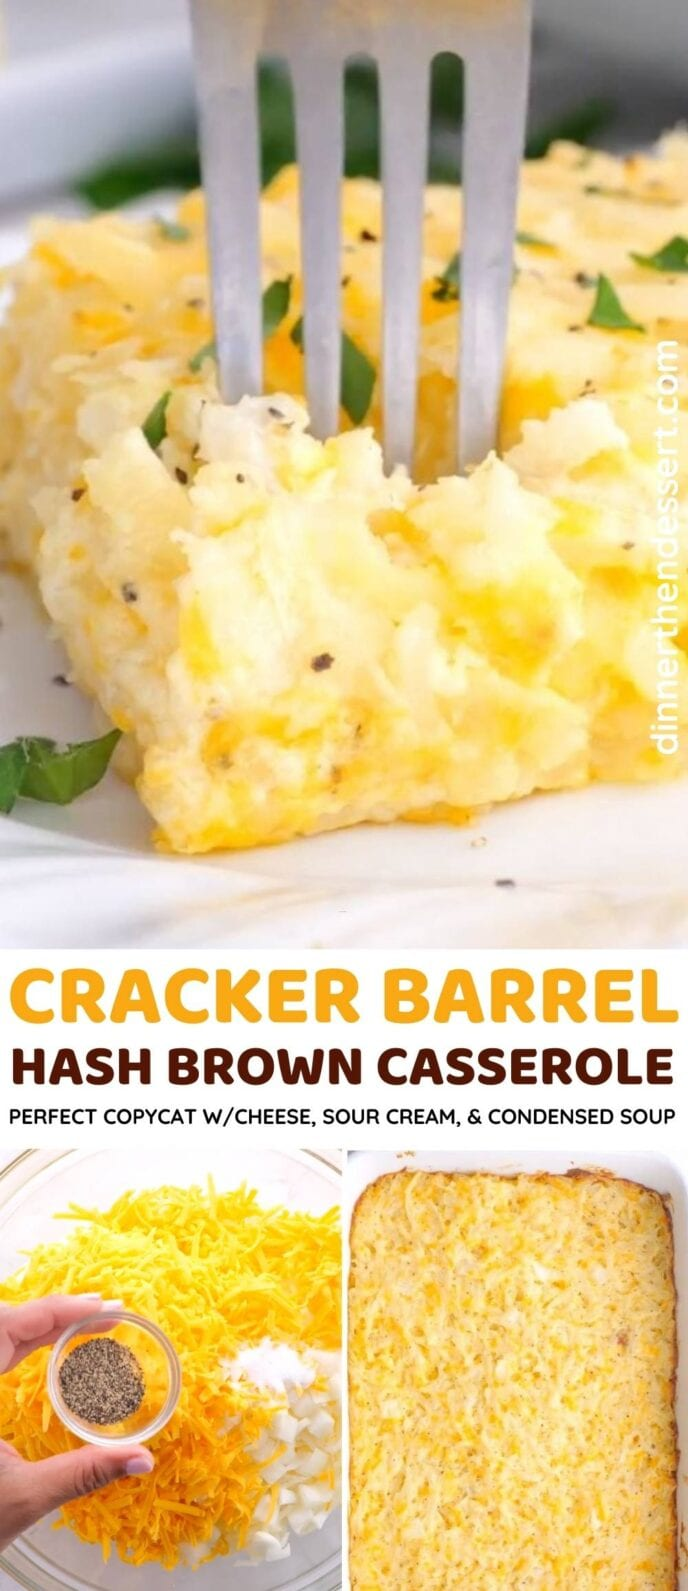 Cracker Barrel Hash Brown Casserole Collage